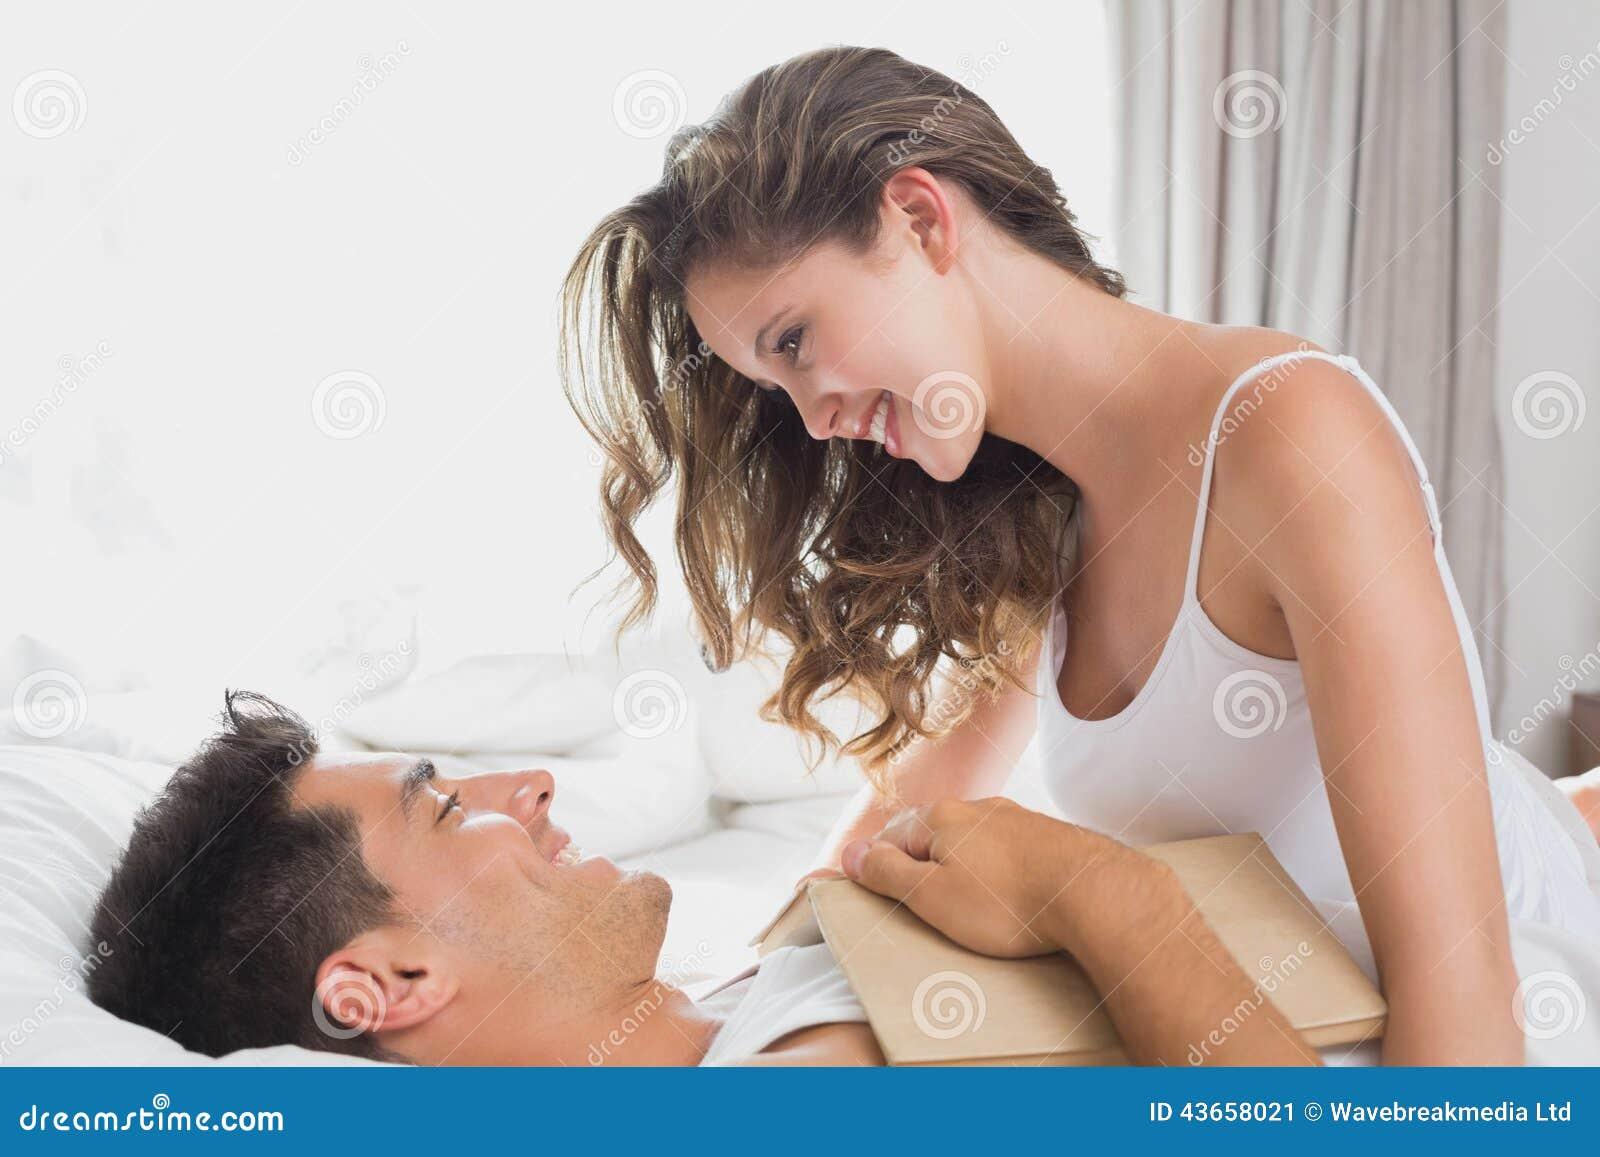 Romantic couple in bed. Romantic Couple In Bed At Home Stock Photo   Image  43658021